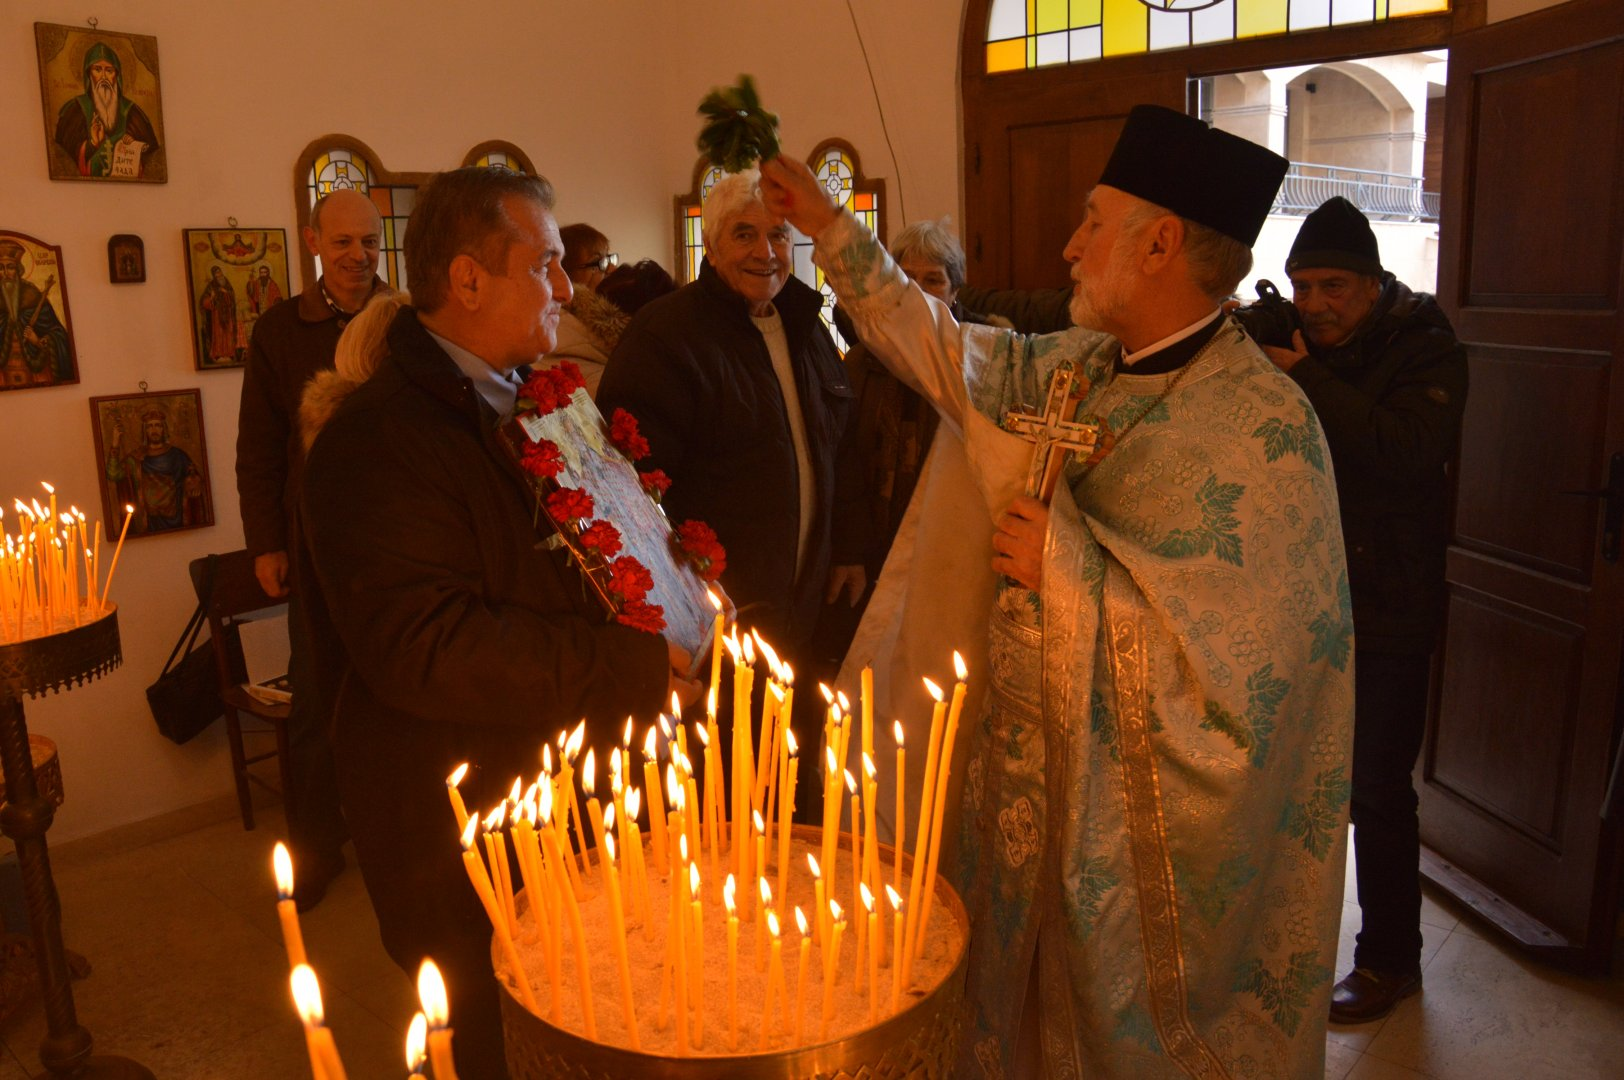 Кметът на Созопол Панайот Рейзи повеше шествието навръх празника. Снимки Община Созопол